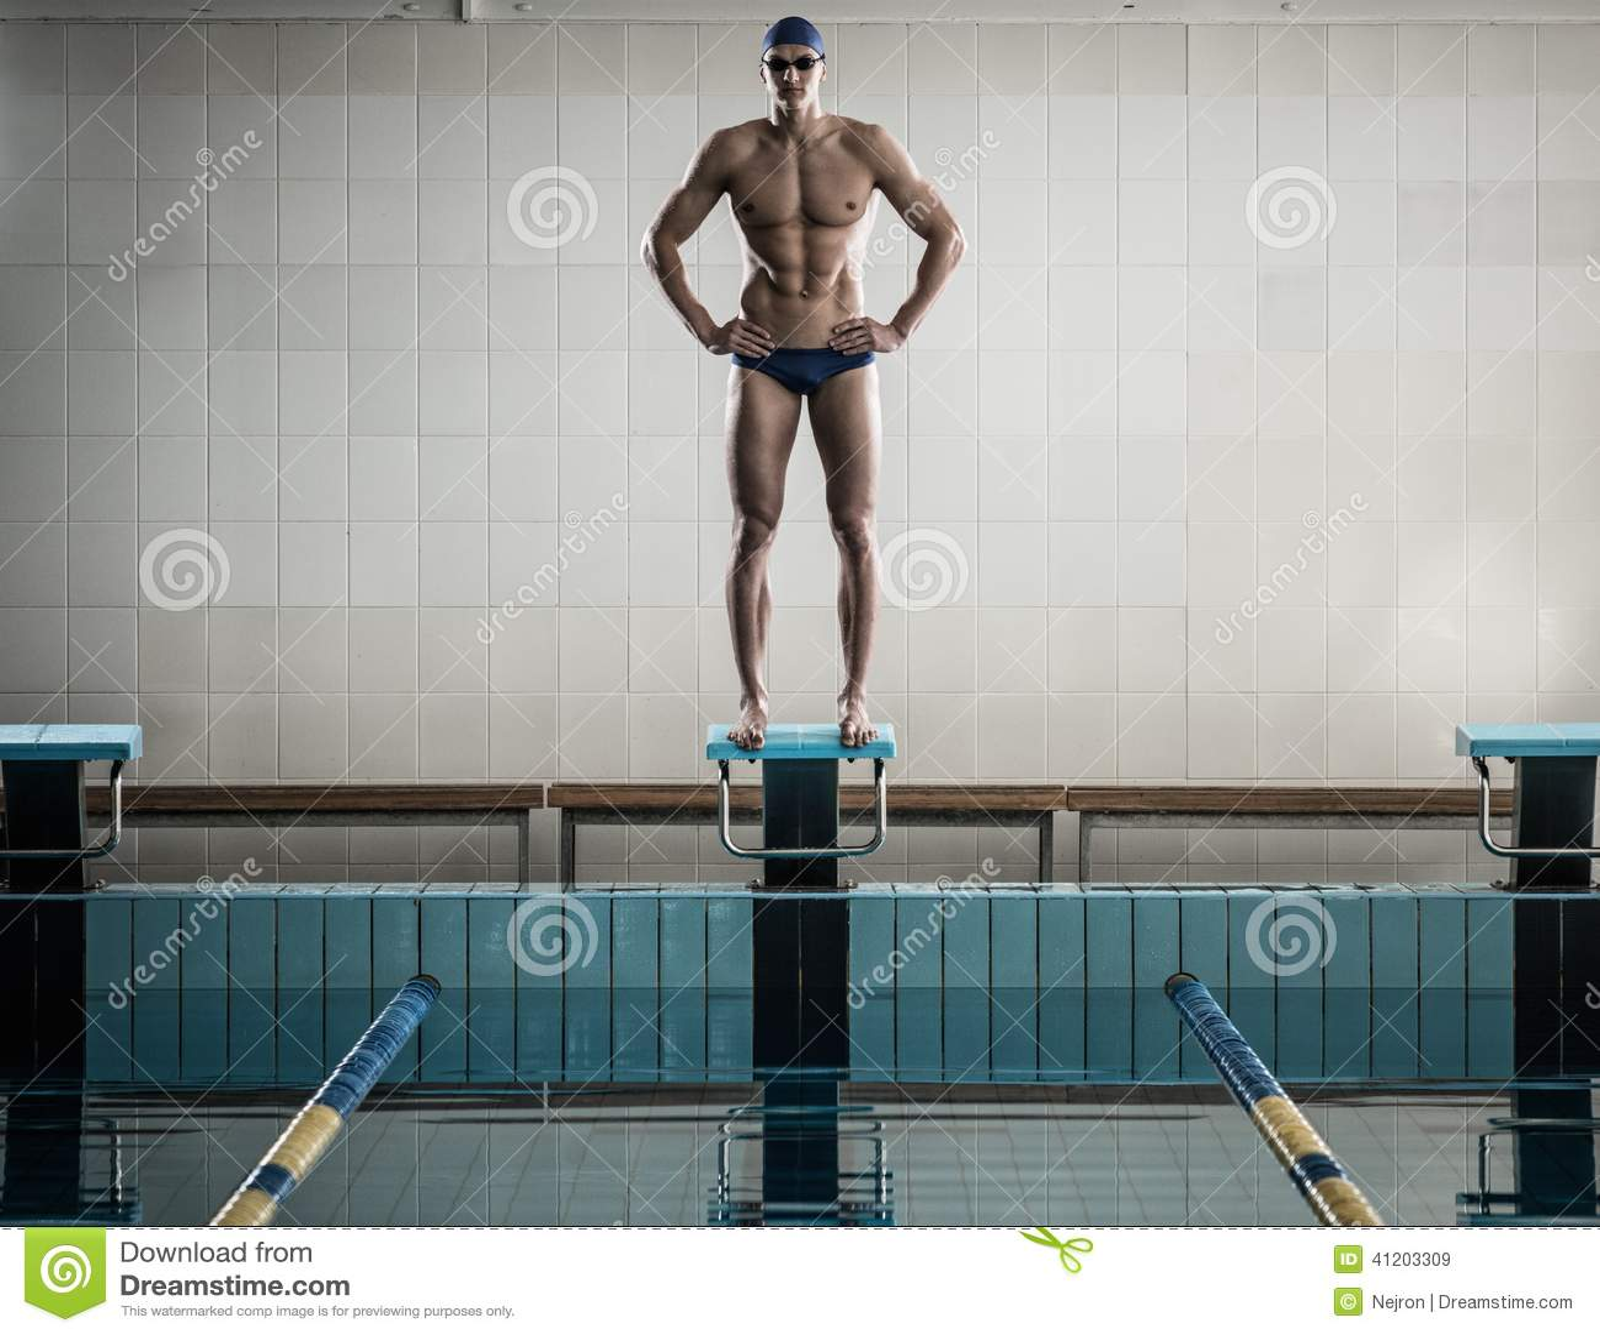 Swimmer standing on starting block stock image image 41203309 - Olympic swimming starting blocks ...